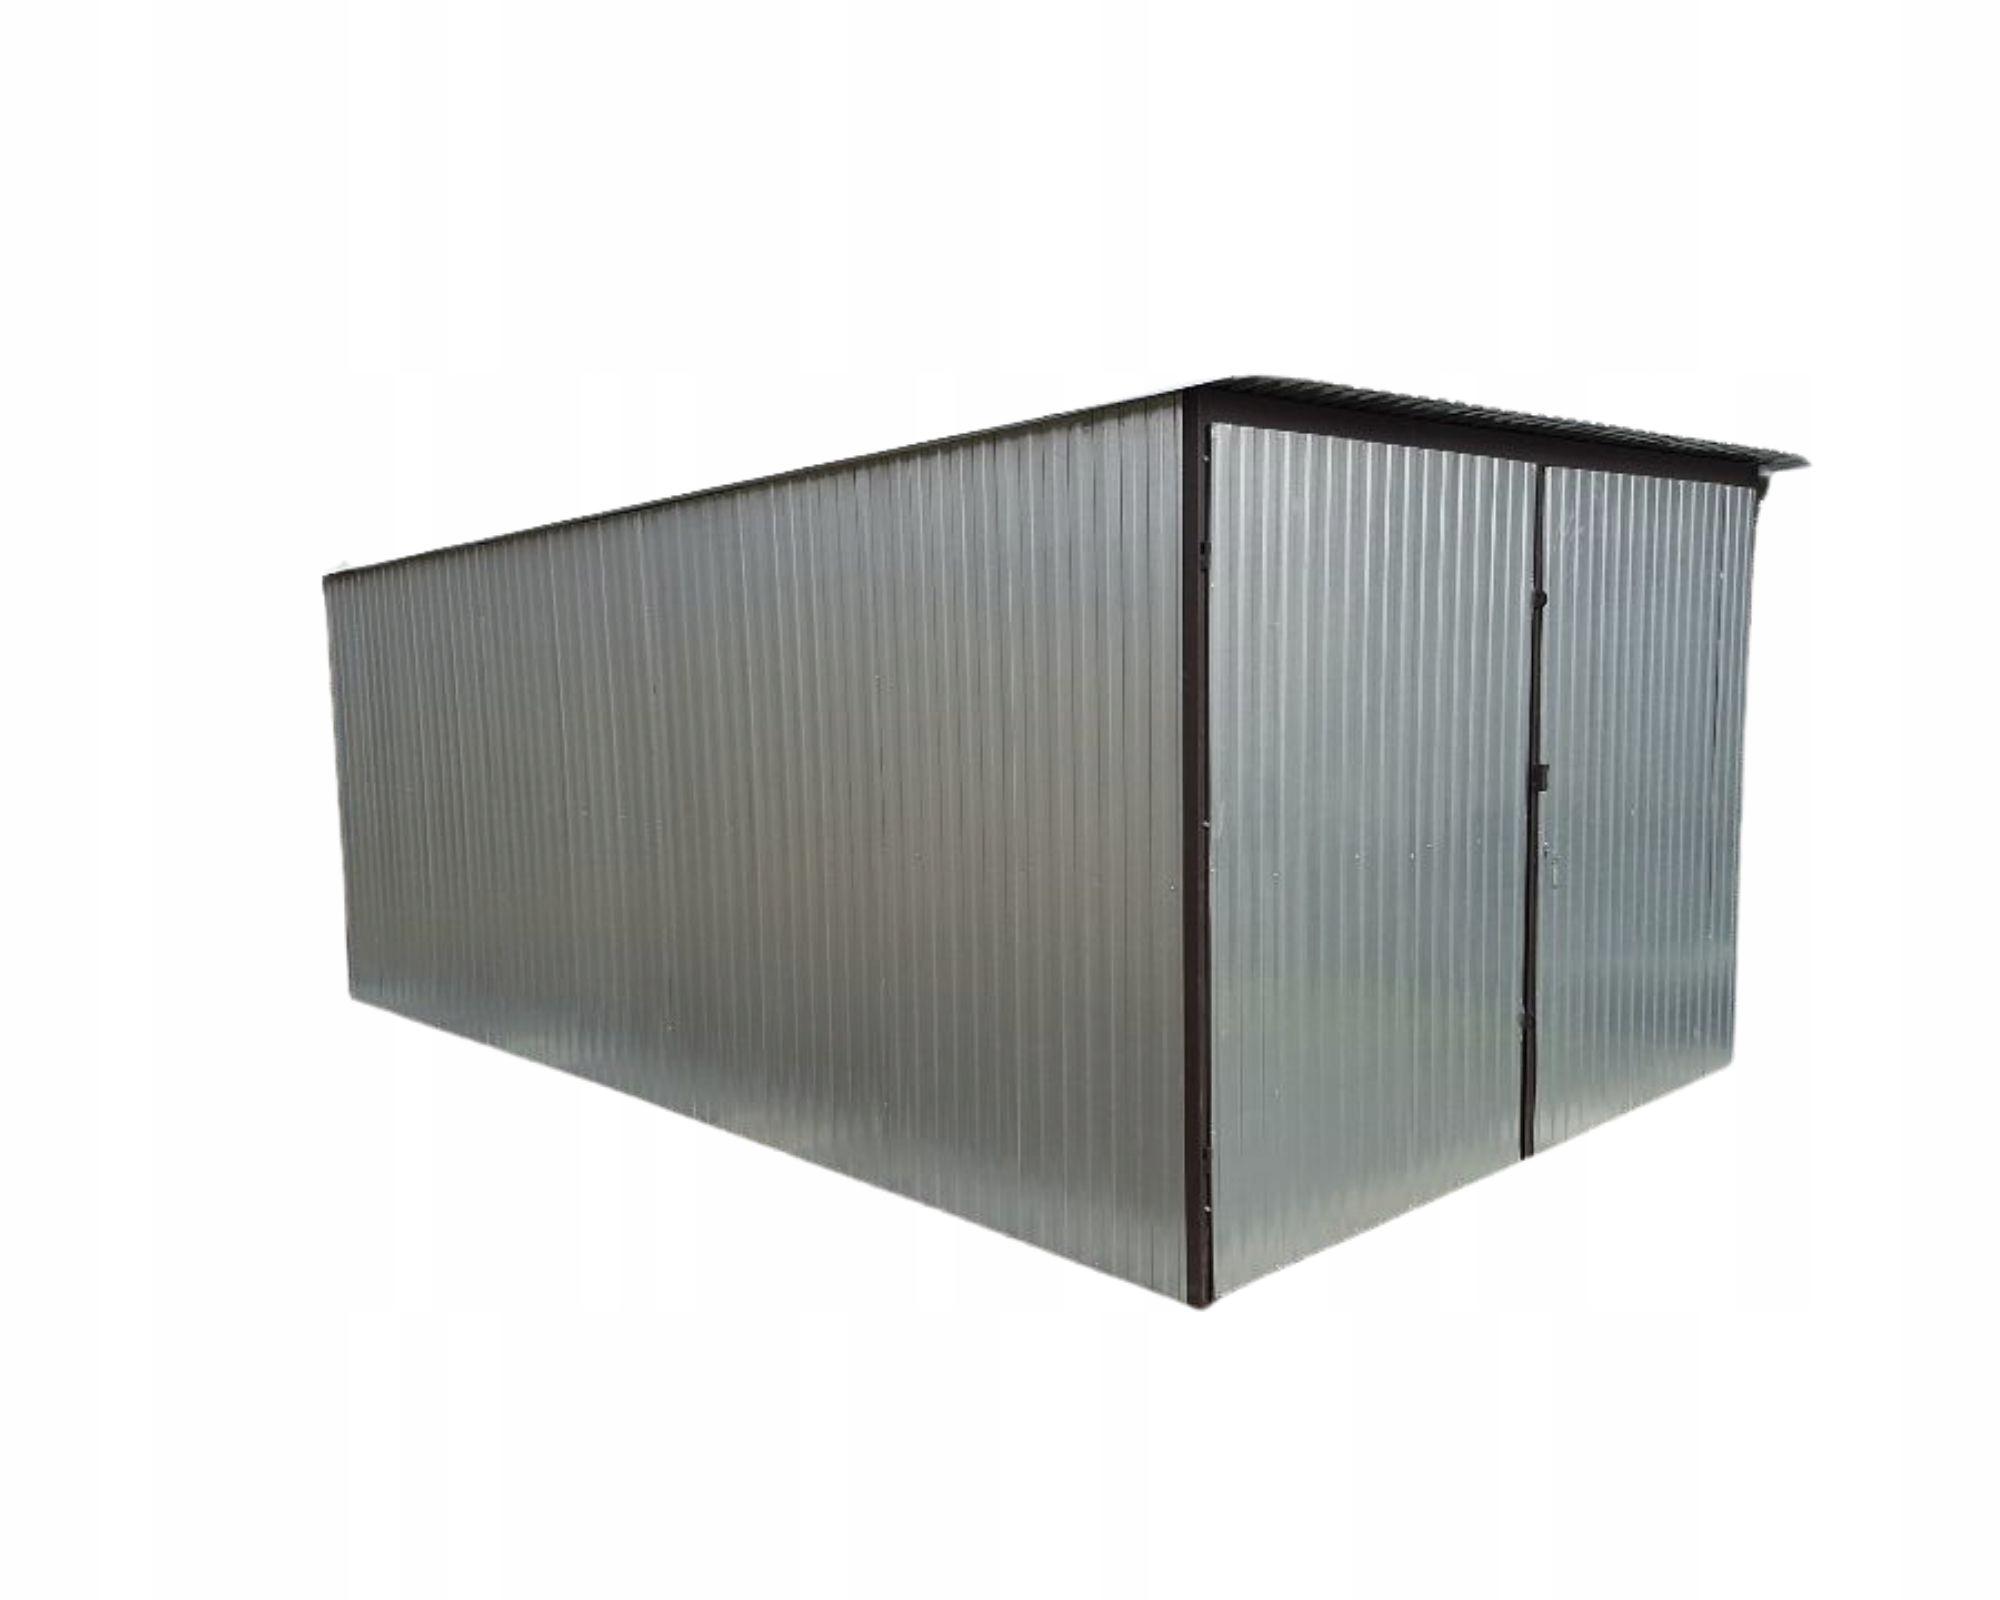 Tin Garage Жестяные гаражи 3x5 Жестяные гаражи Малопольское воеводство